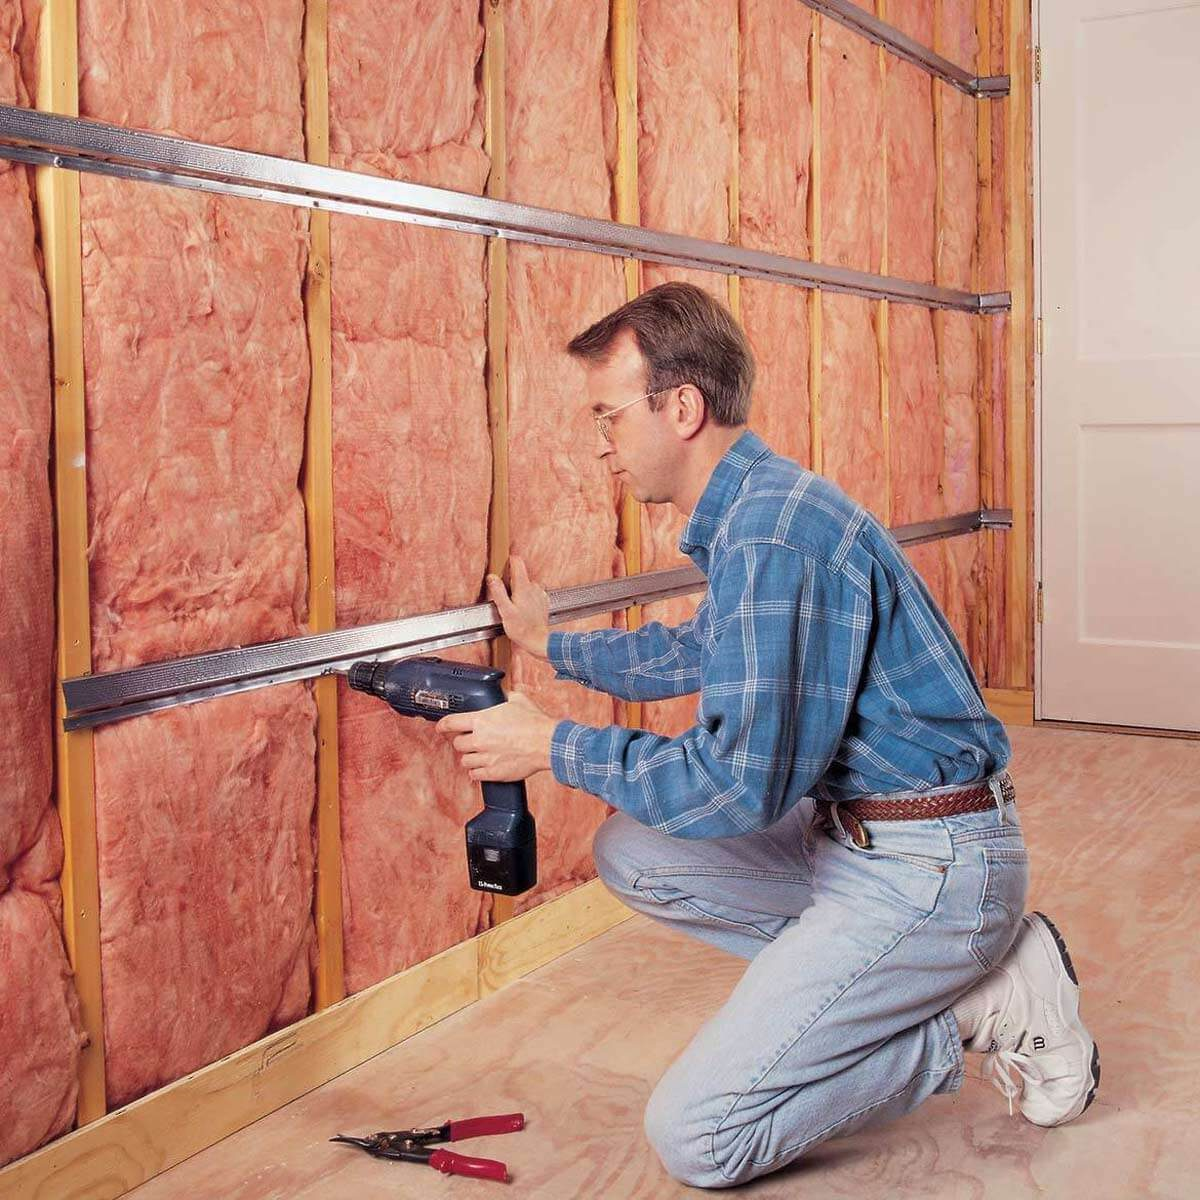 dfh17aug021_fh98jun_01341005 insulate garage